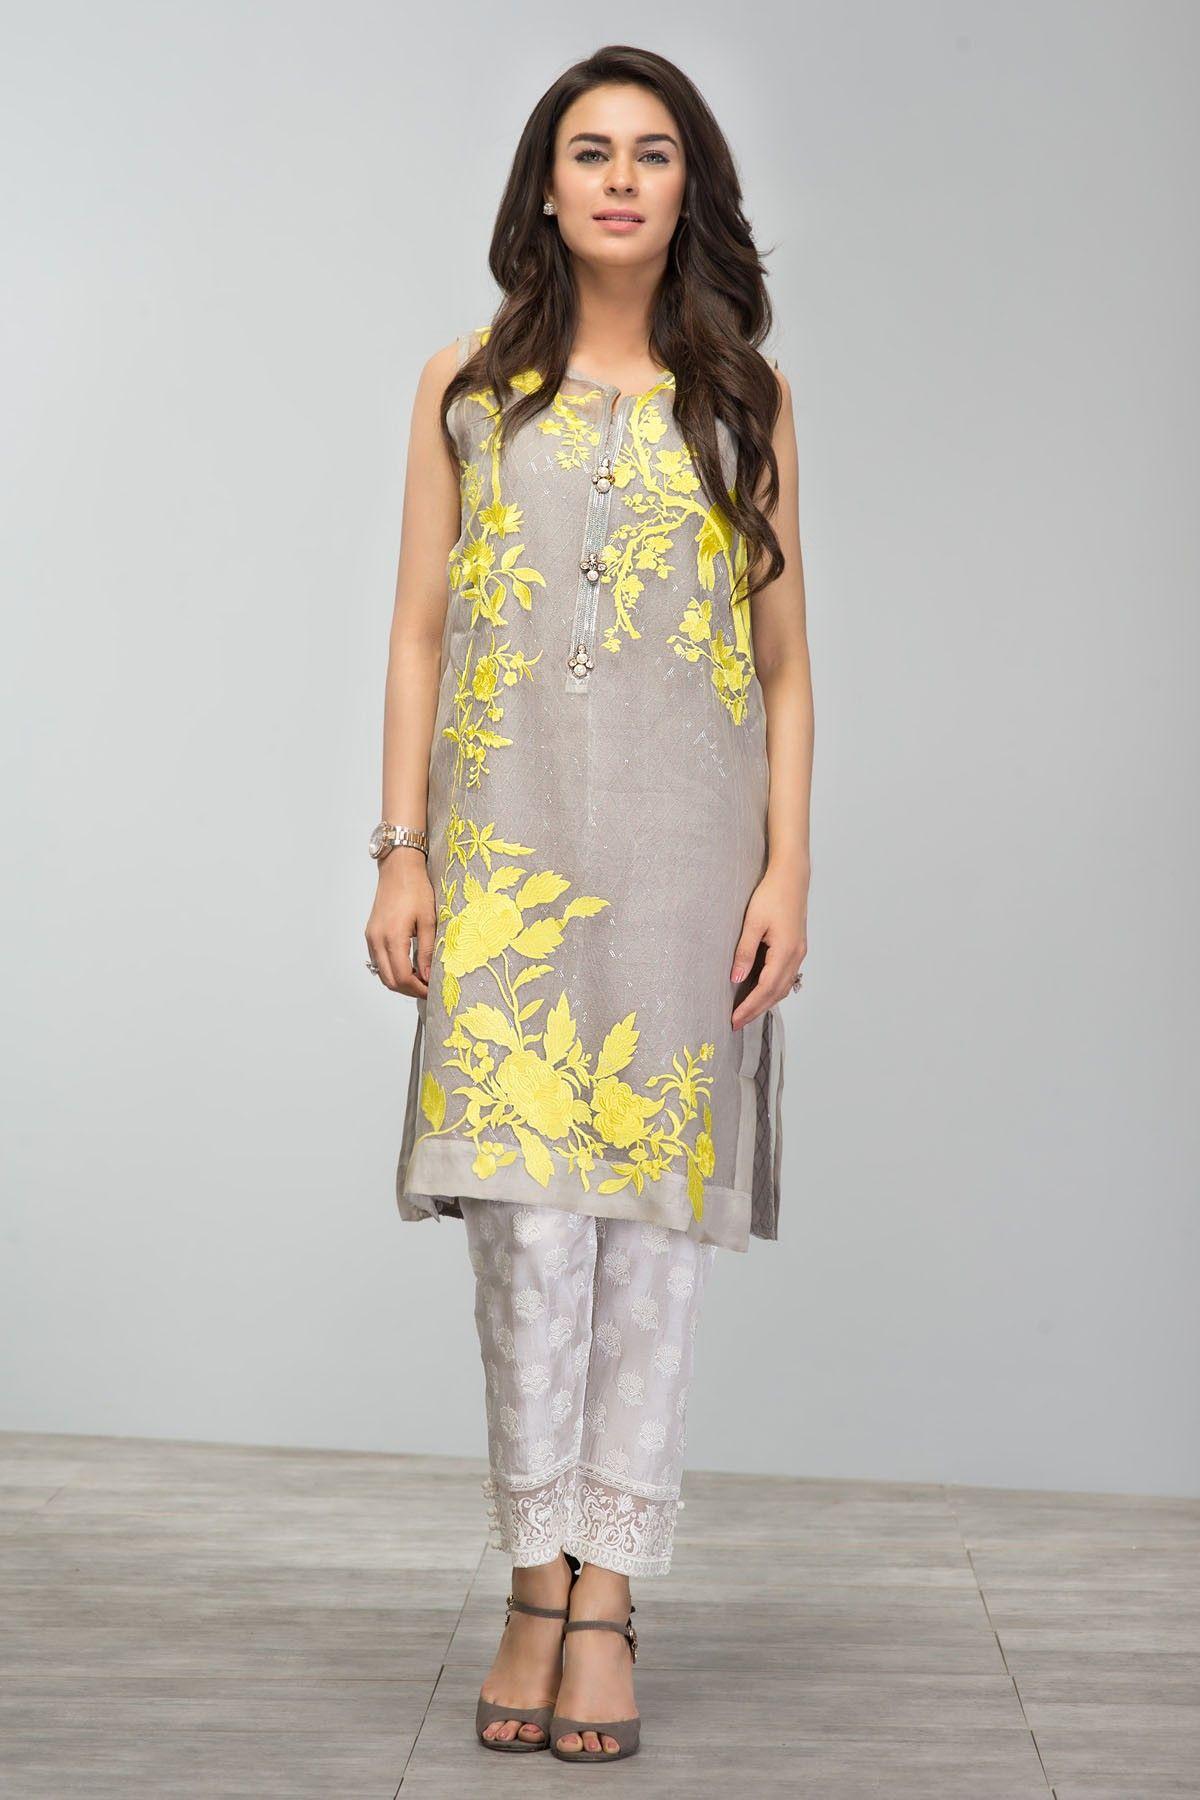 Khaadi - Embroidered Kurta - Khaas | Pretty Pakistan | Pinterest ...